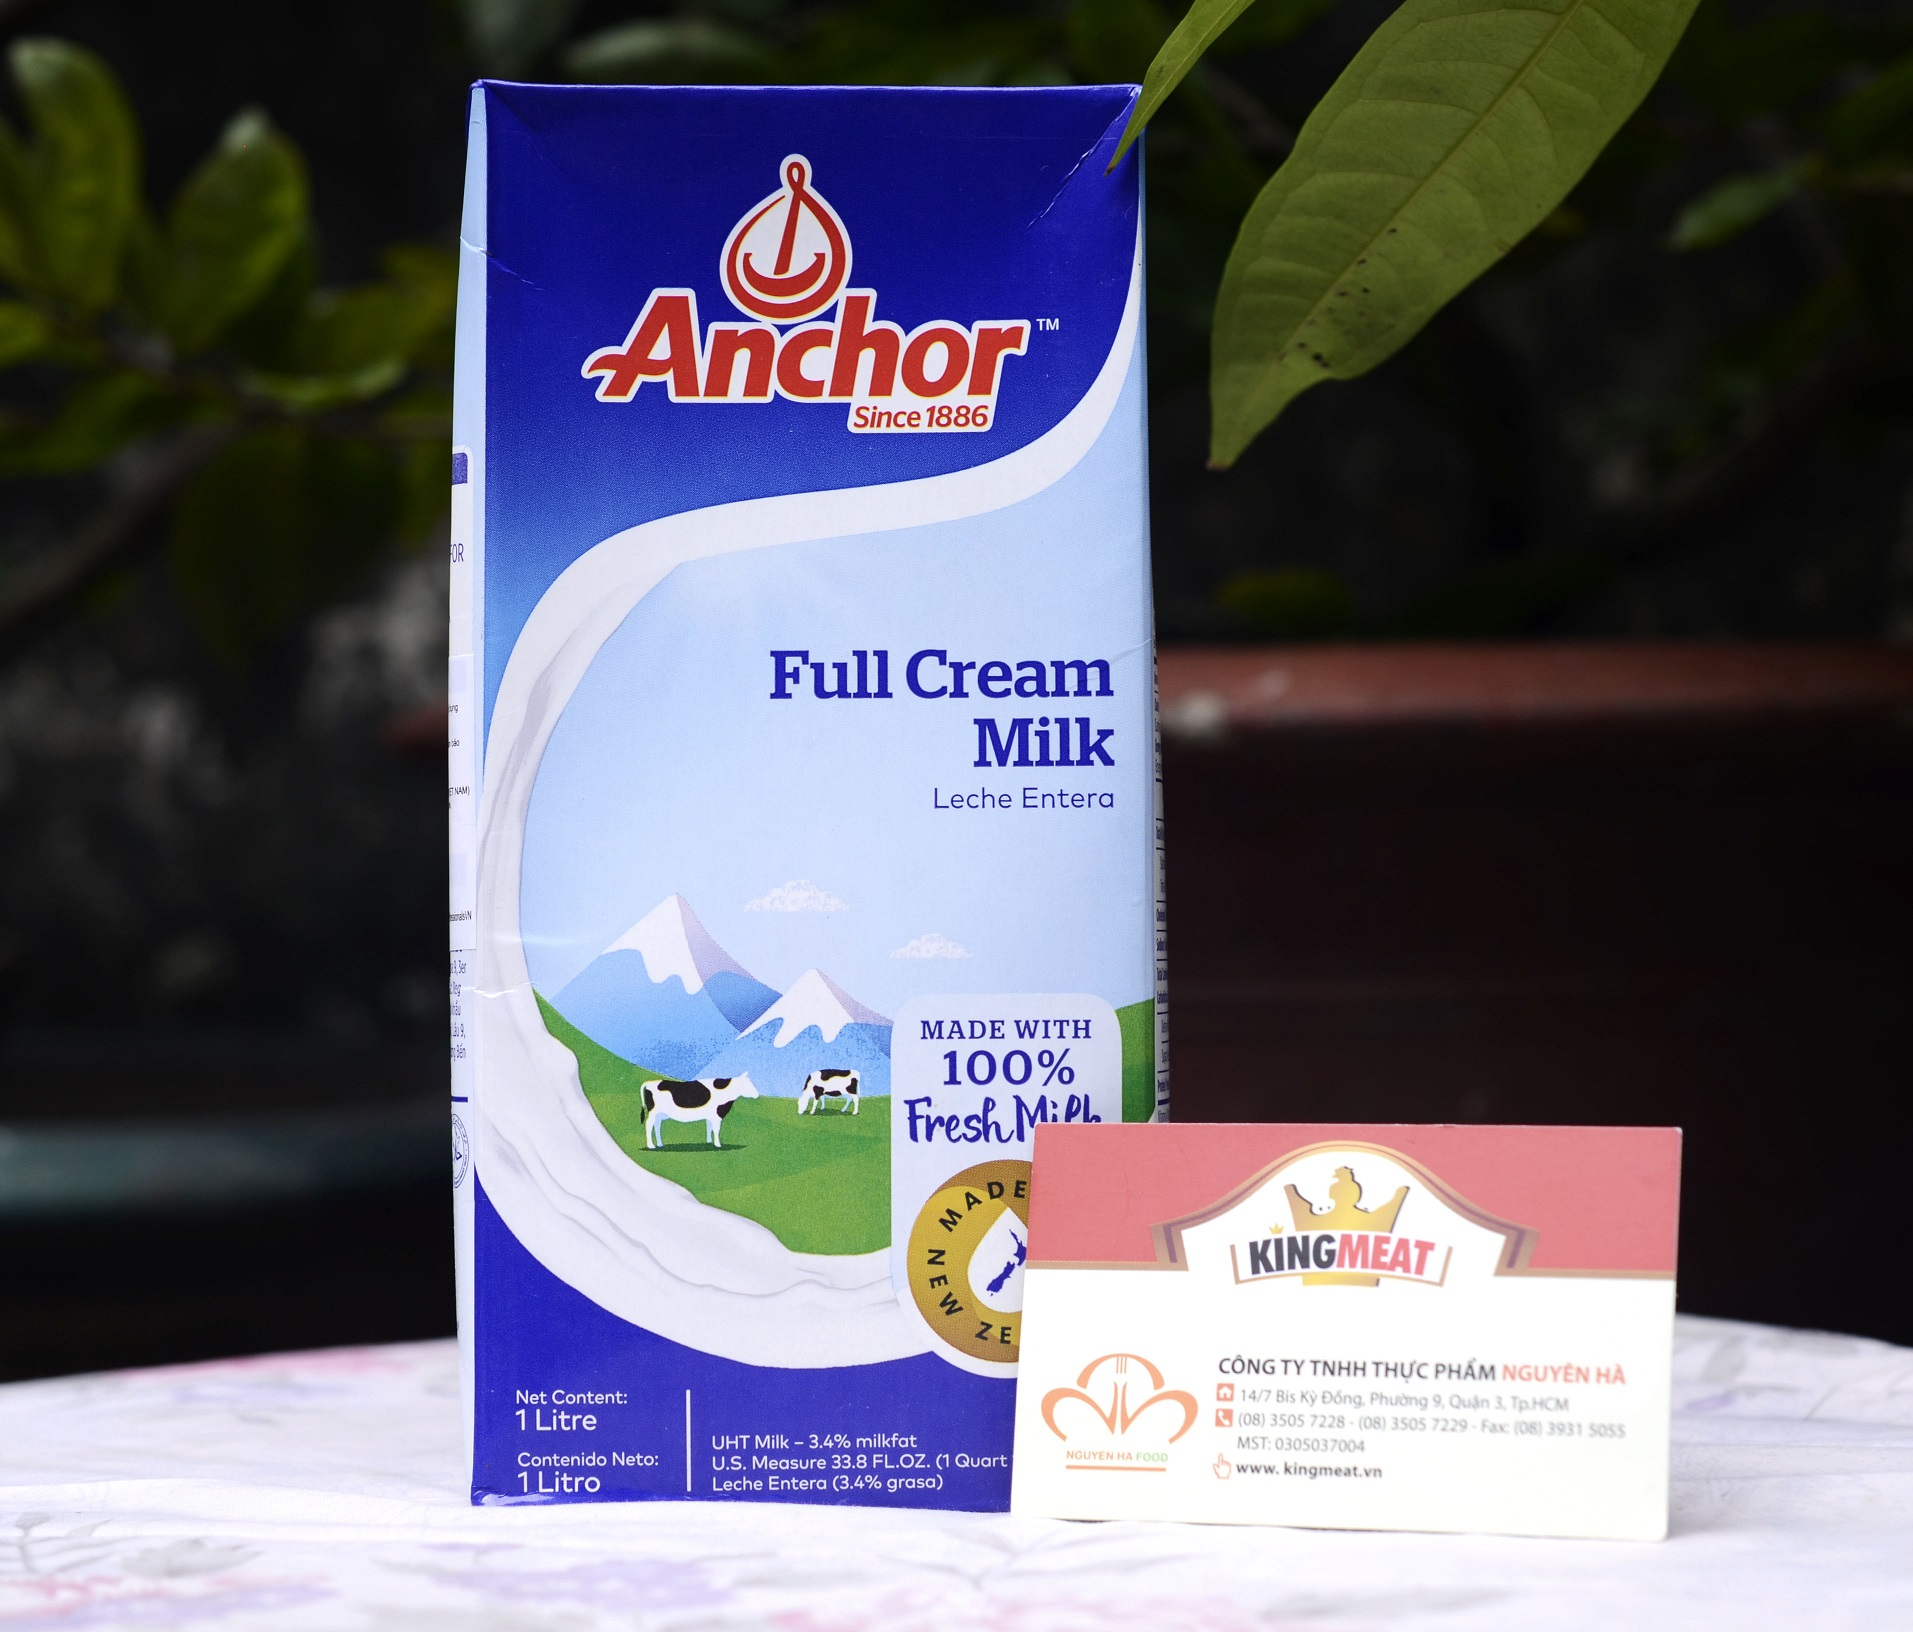 sua-tuoi-tiet-trung-nguyen-kem-anchor--anchor-uht-full-cream-fresh-milk-leche-entera--hop-1-l-01